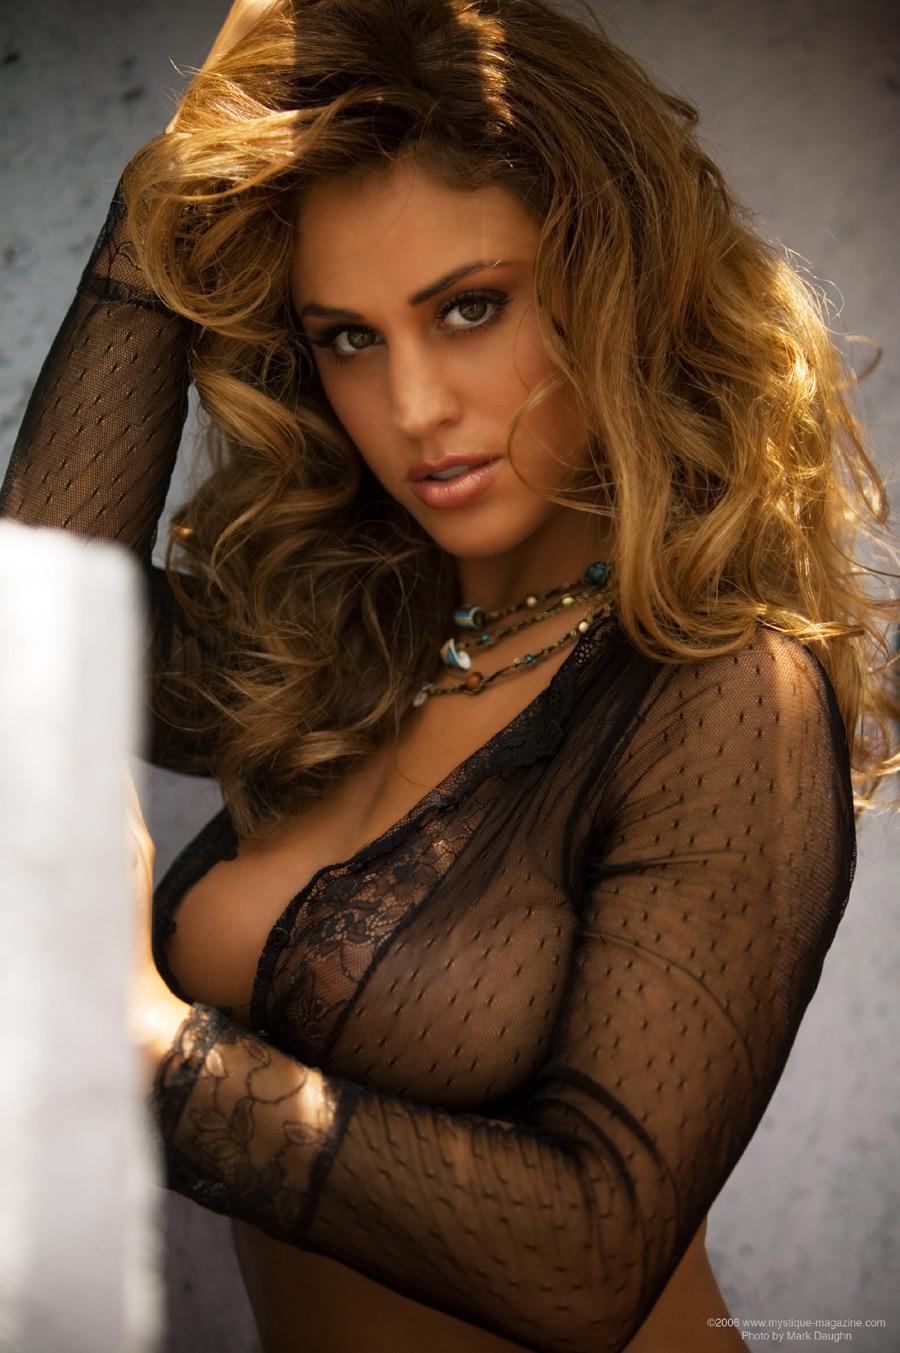 Sorry, this rebecca dipietro nude fakes